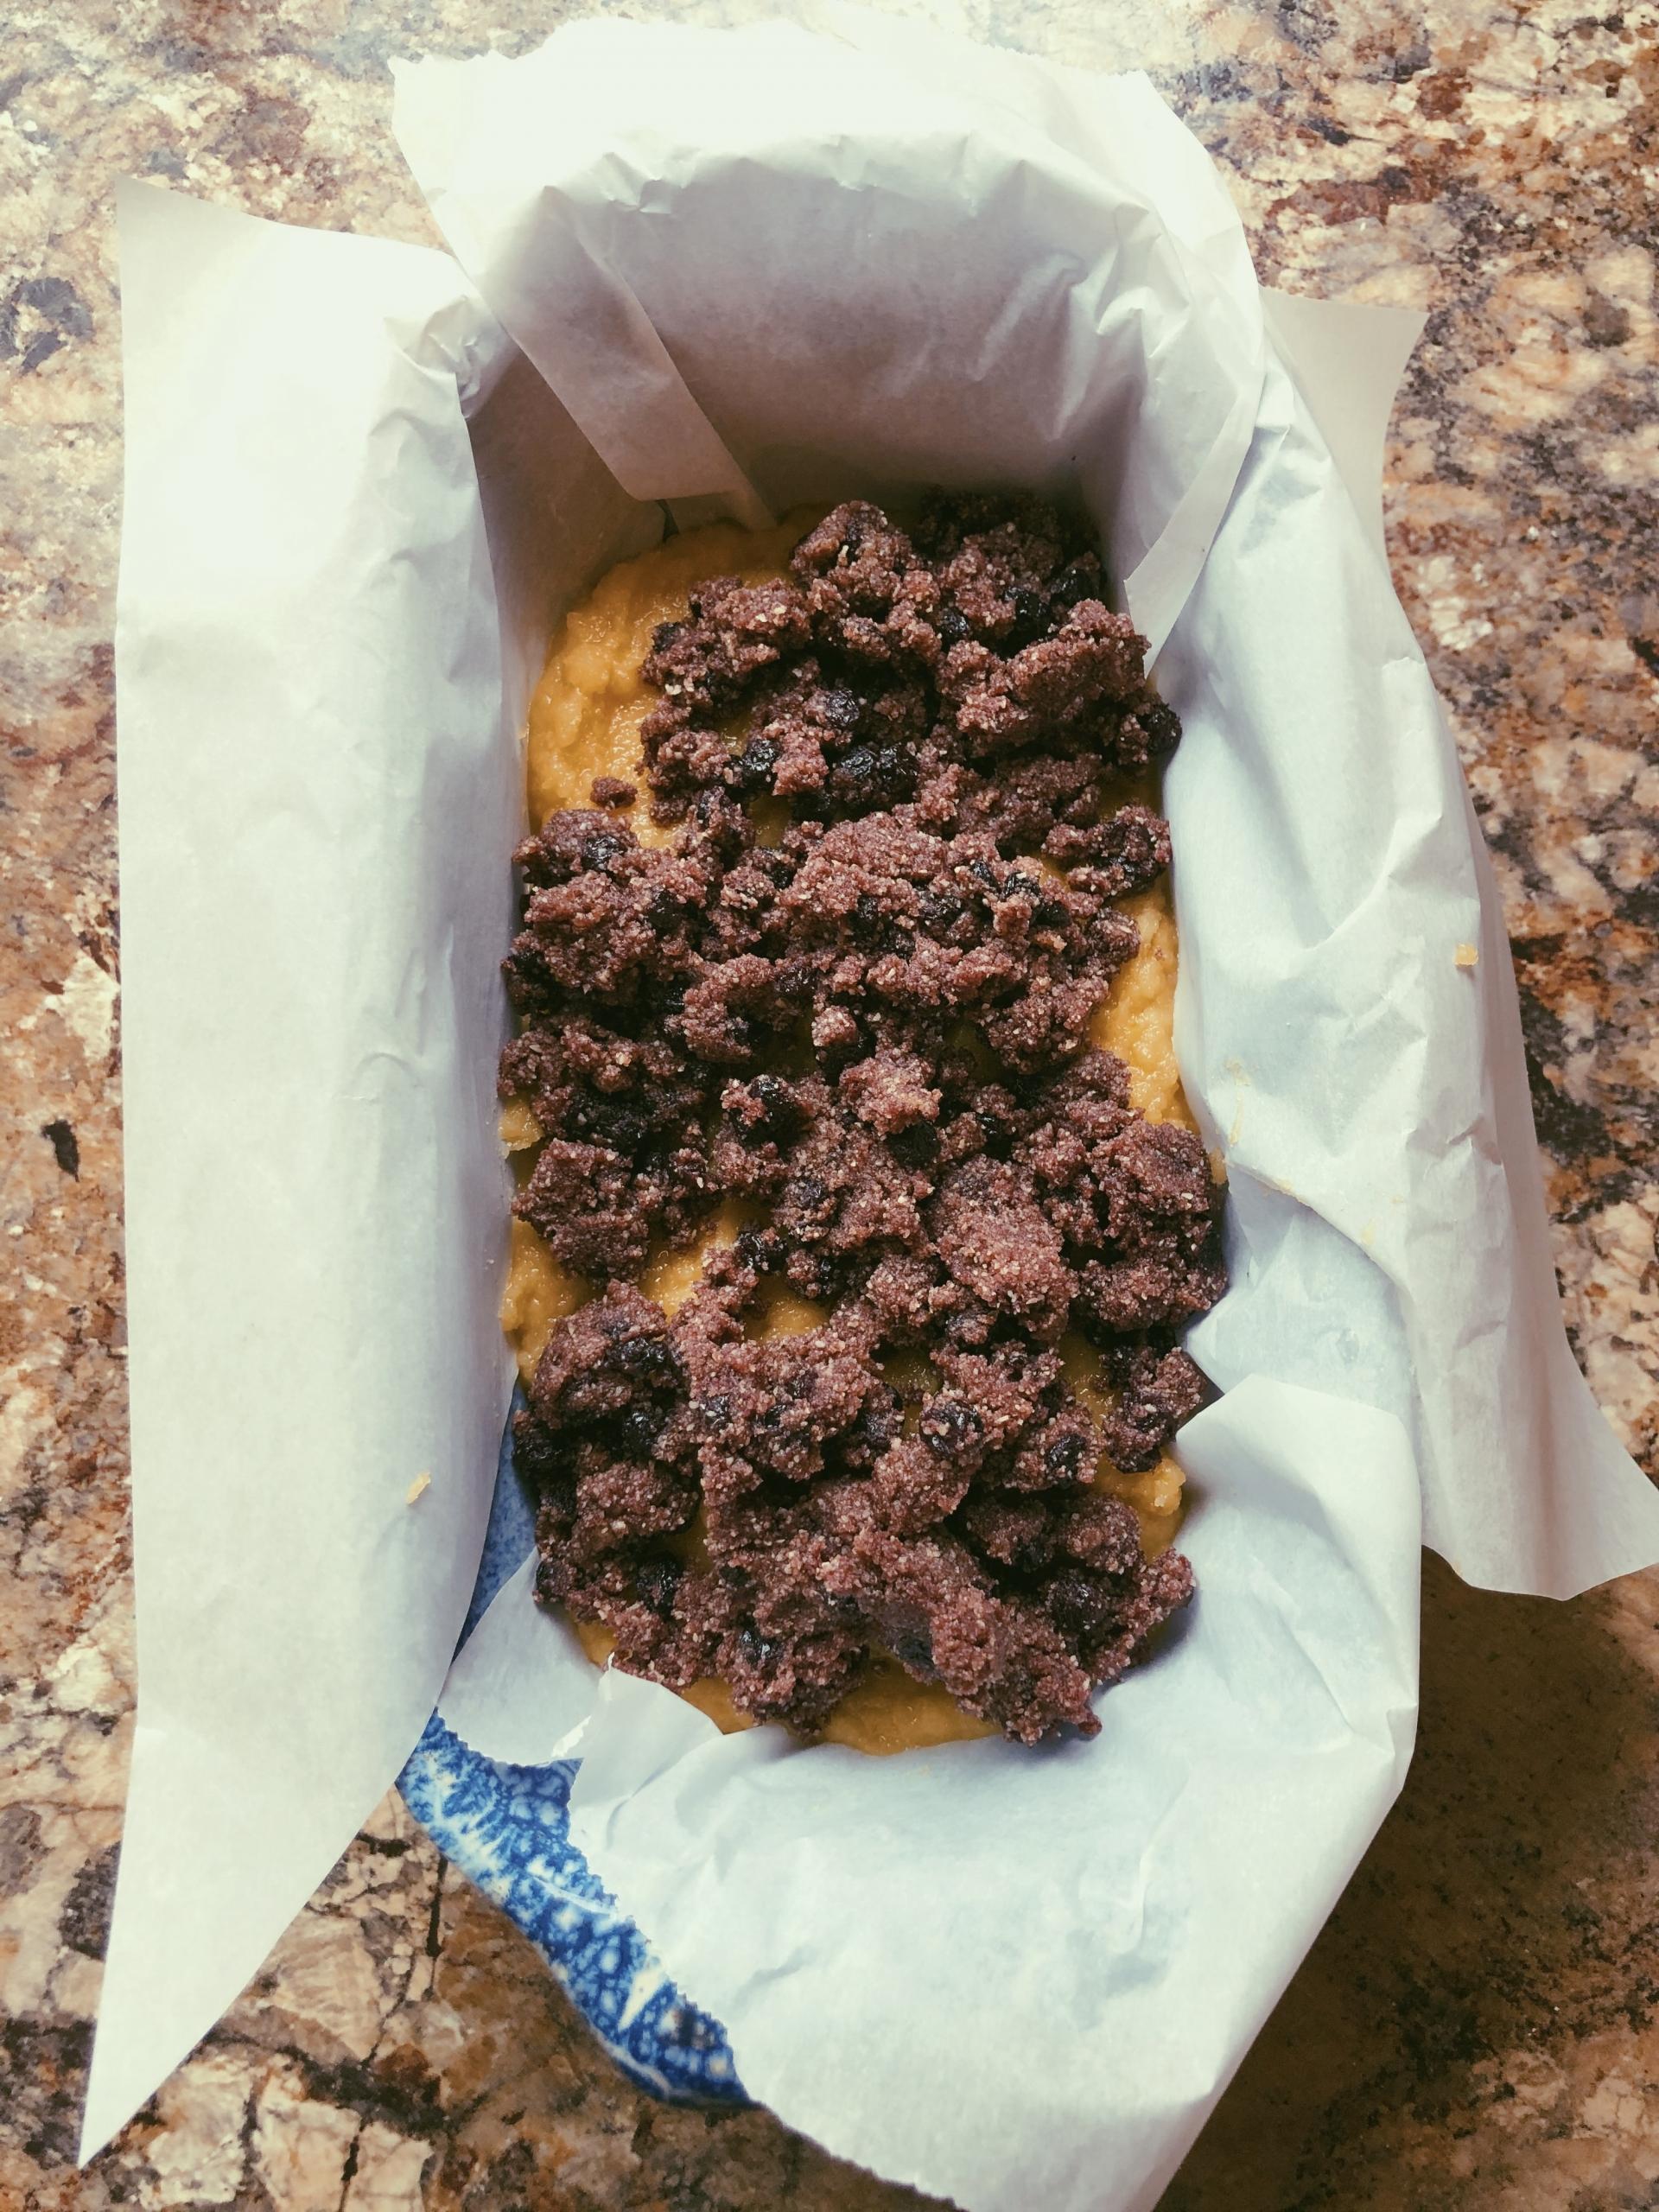 lemon olive oil loaf with blueberry cinnamon streusel (grain free, refined sugar free, scd diet)